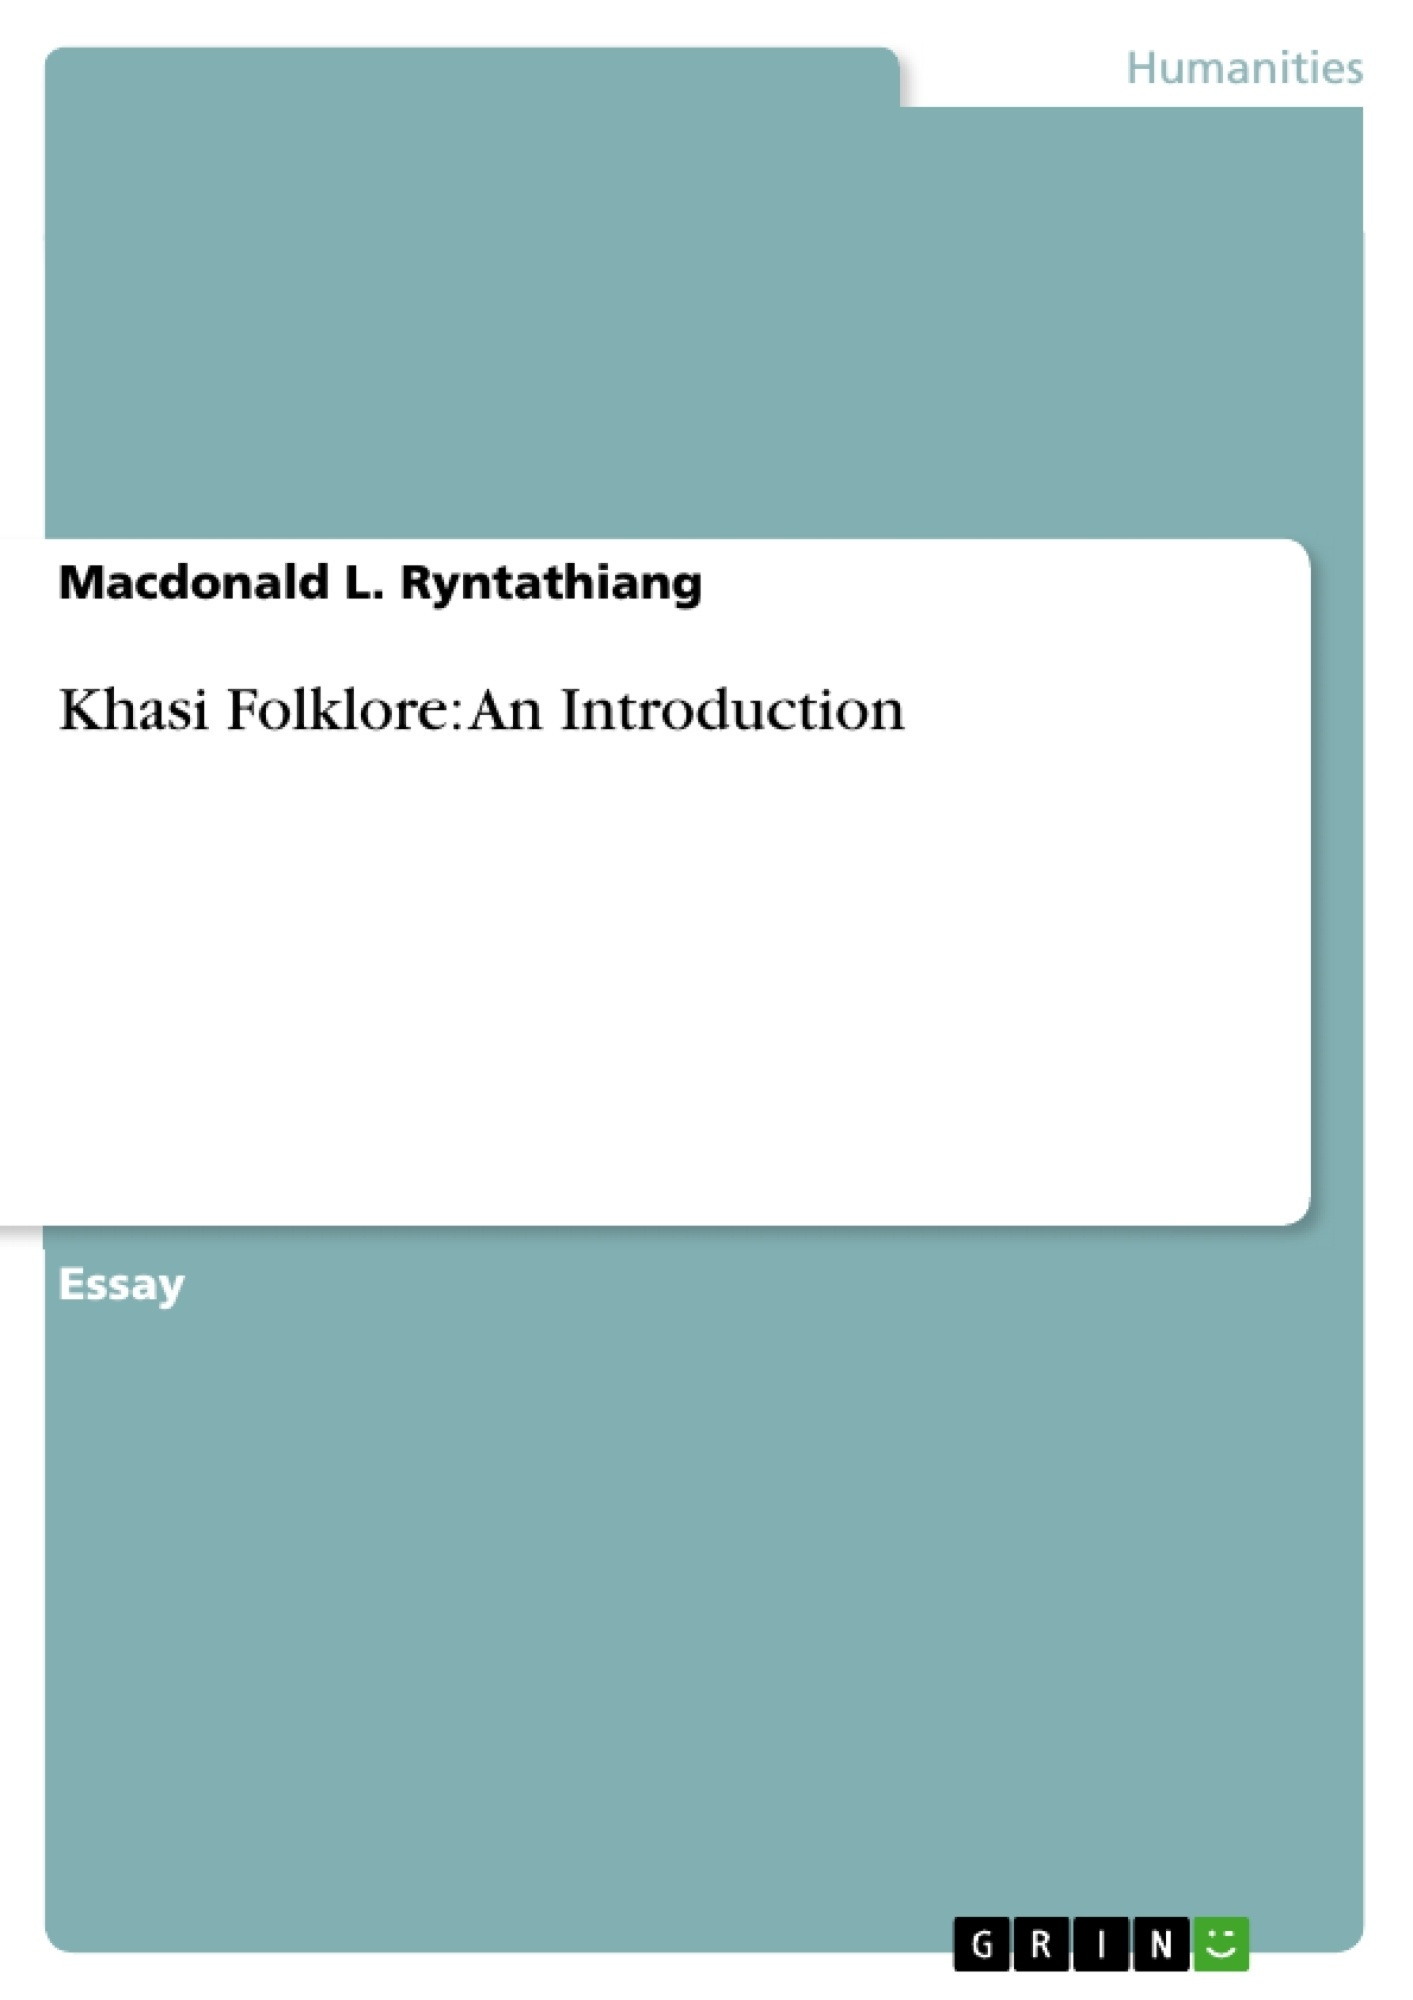 Title: Khasi Folklore: An Introduction